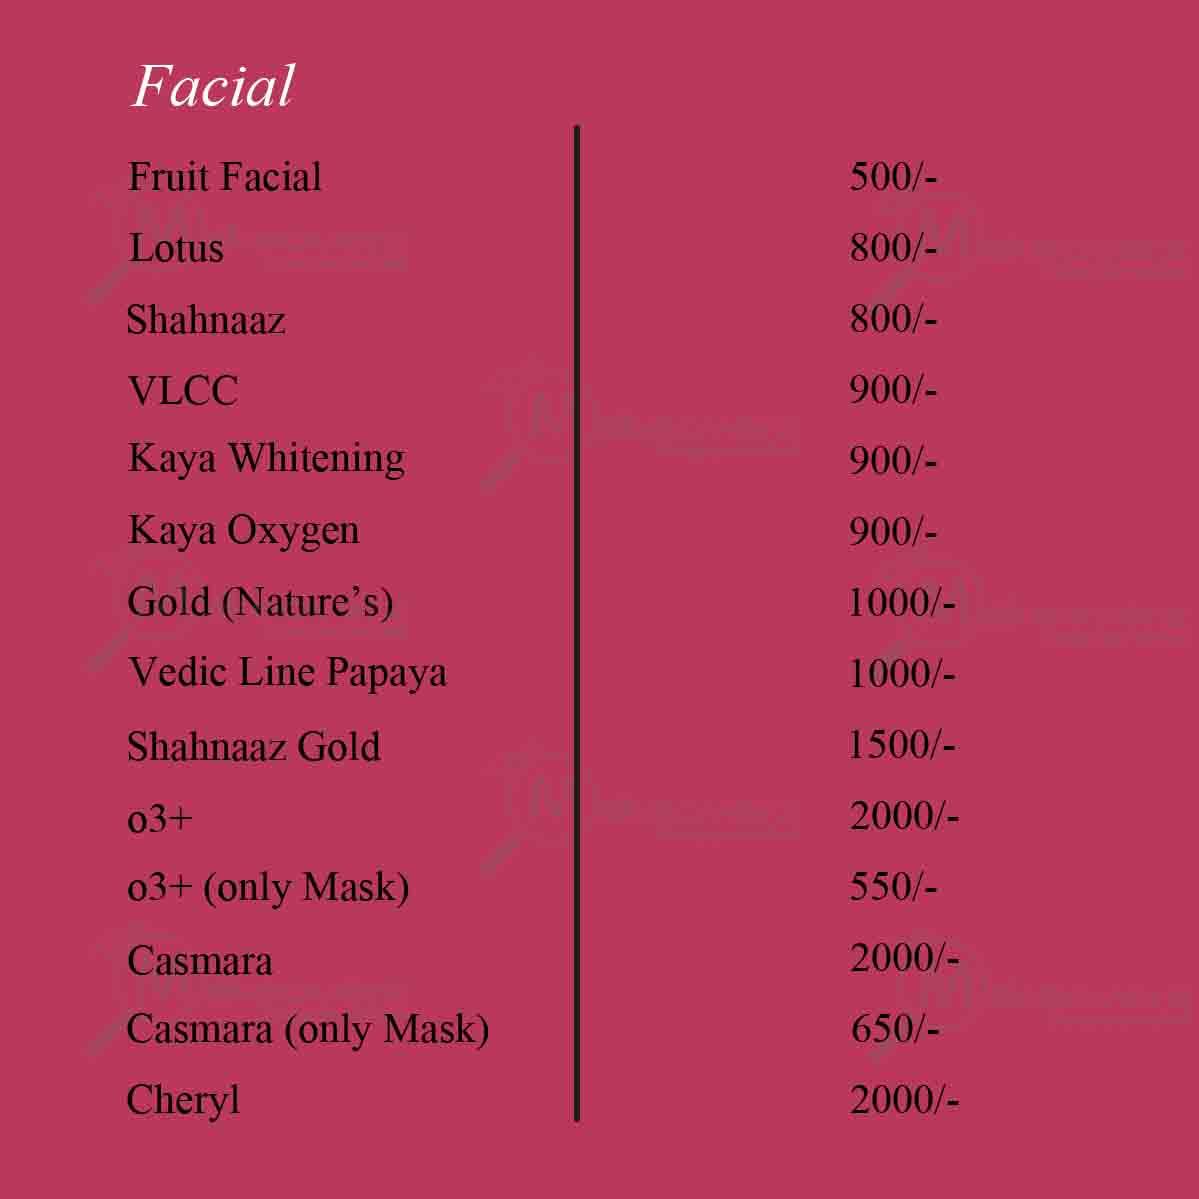 Habib salon price list in bangalore dating 7